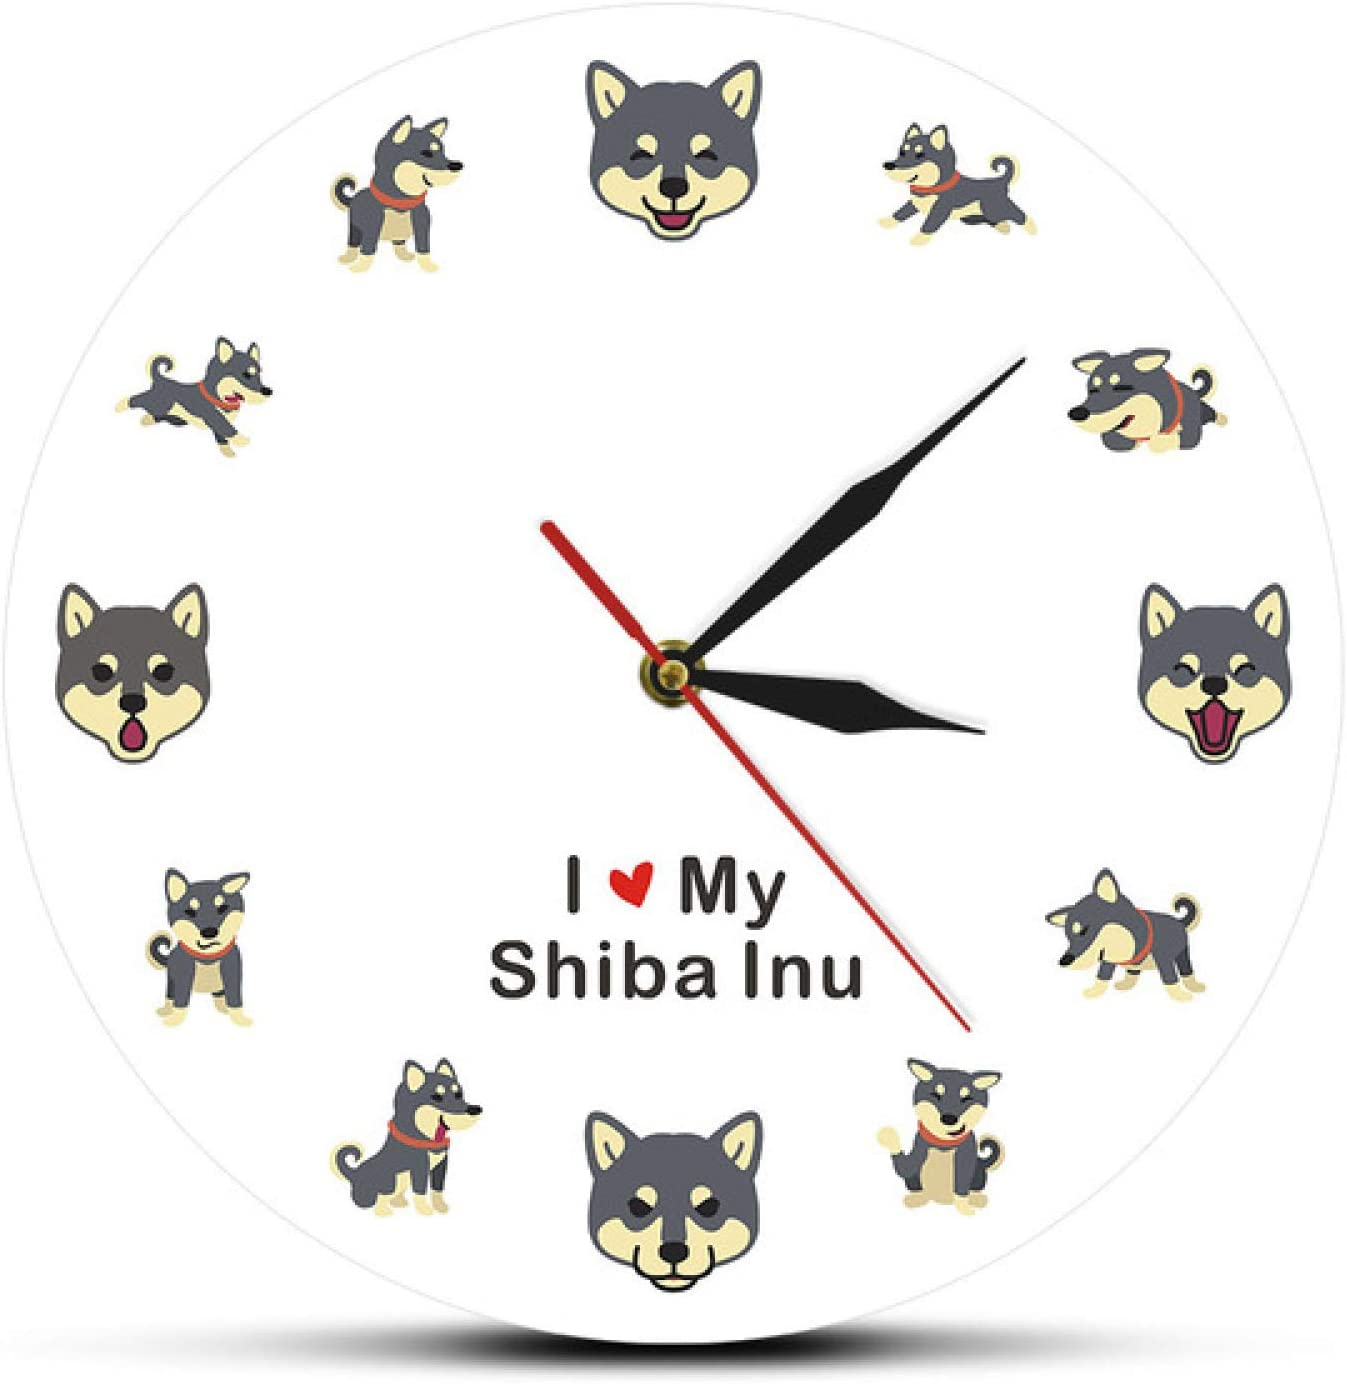 hufeng Wall Clock I Love My Shiba Inu Modern Wall Clock Japanese Small Size Dog Living Room Silent Wall Watch Pet Shop Decor Dog Pet Owner Gift